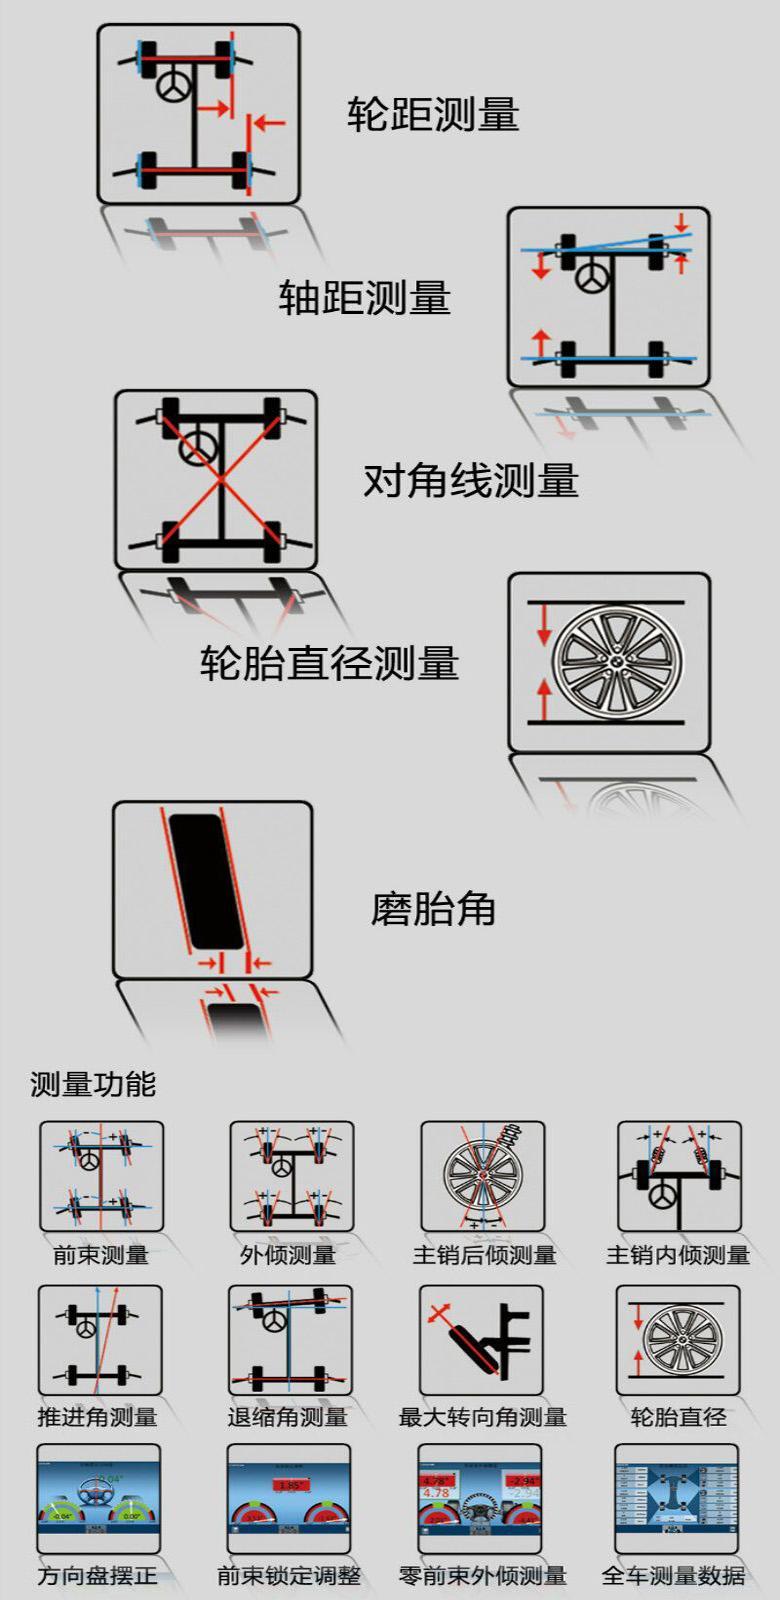 3D四輪定位儀 DT211C 手動滑動橫杆固定機櫃款 4